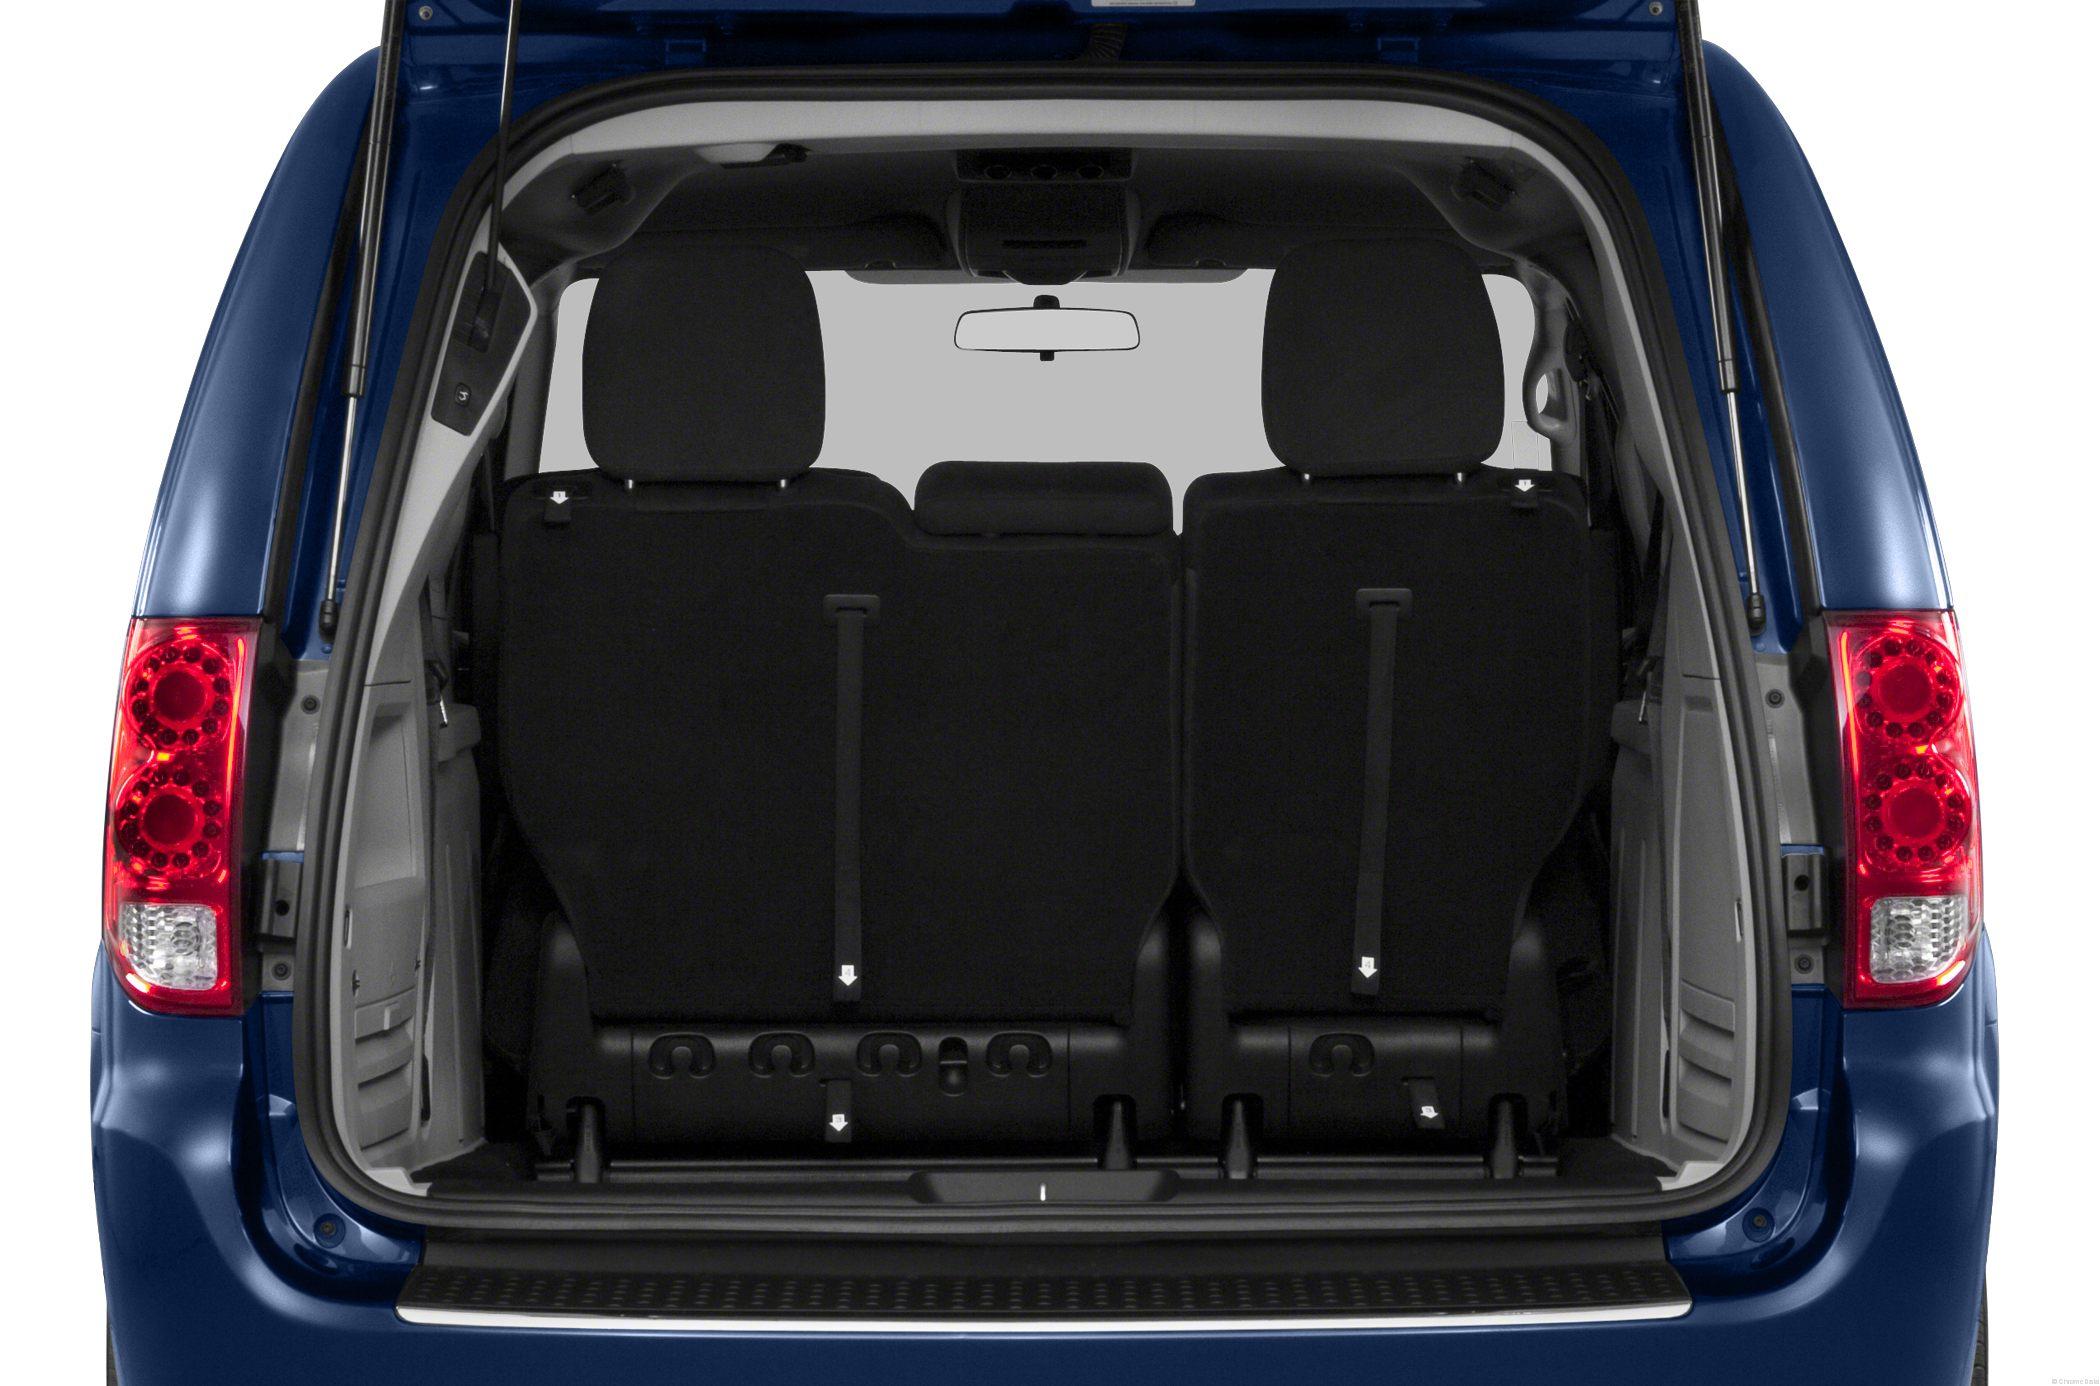 2013 Dodge Grand Caravan - Information and photos - ZombieDrive